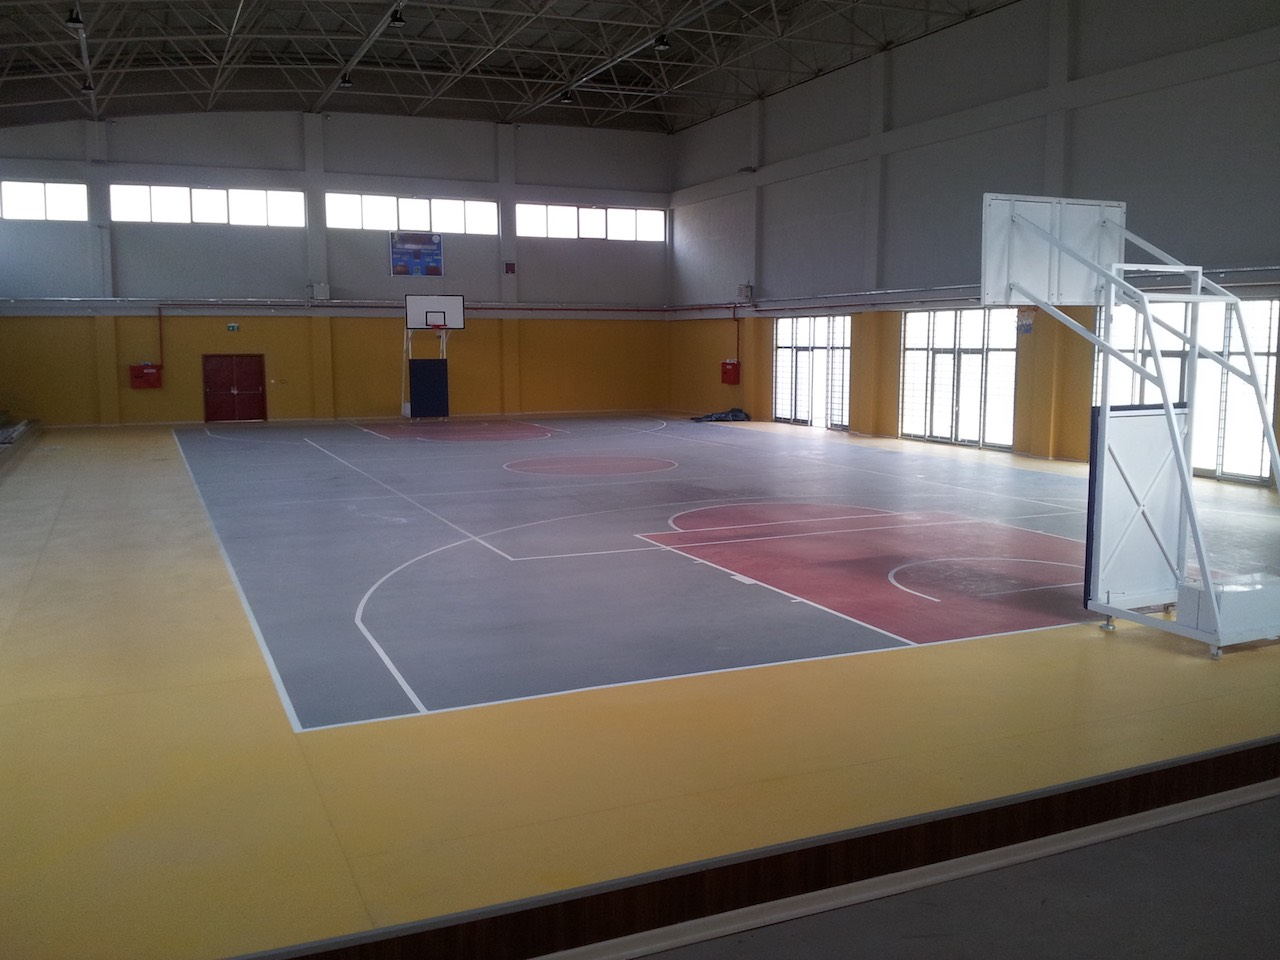 Anahtar teslim spor salonu inşaatı